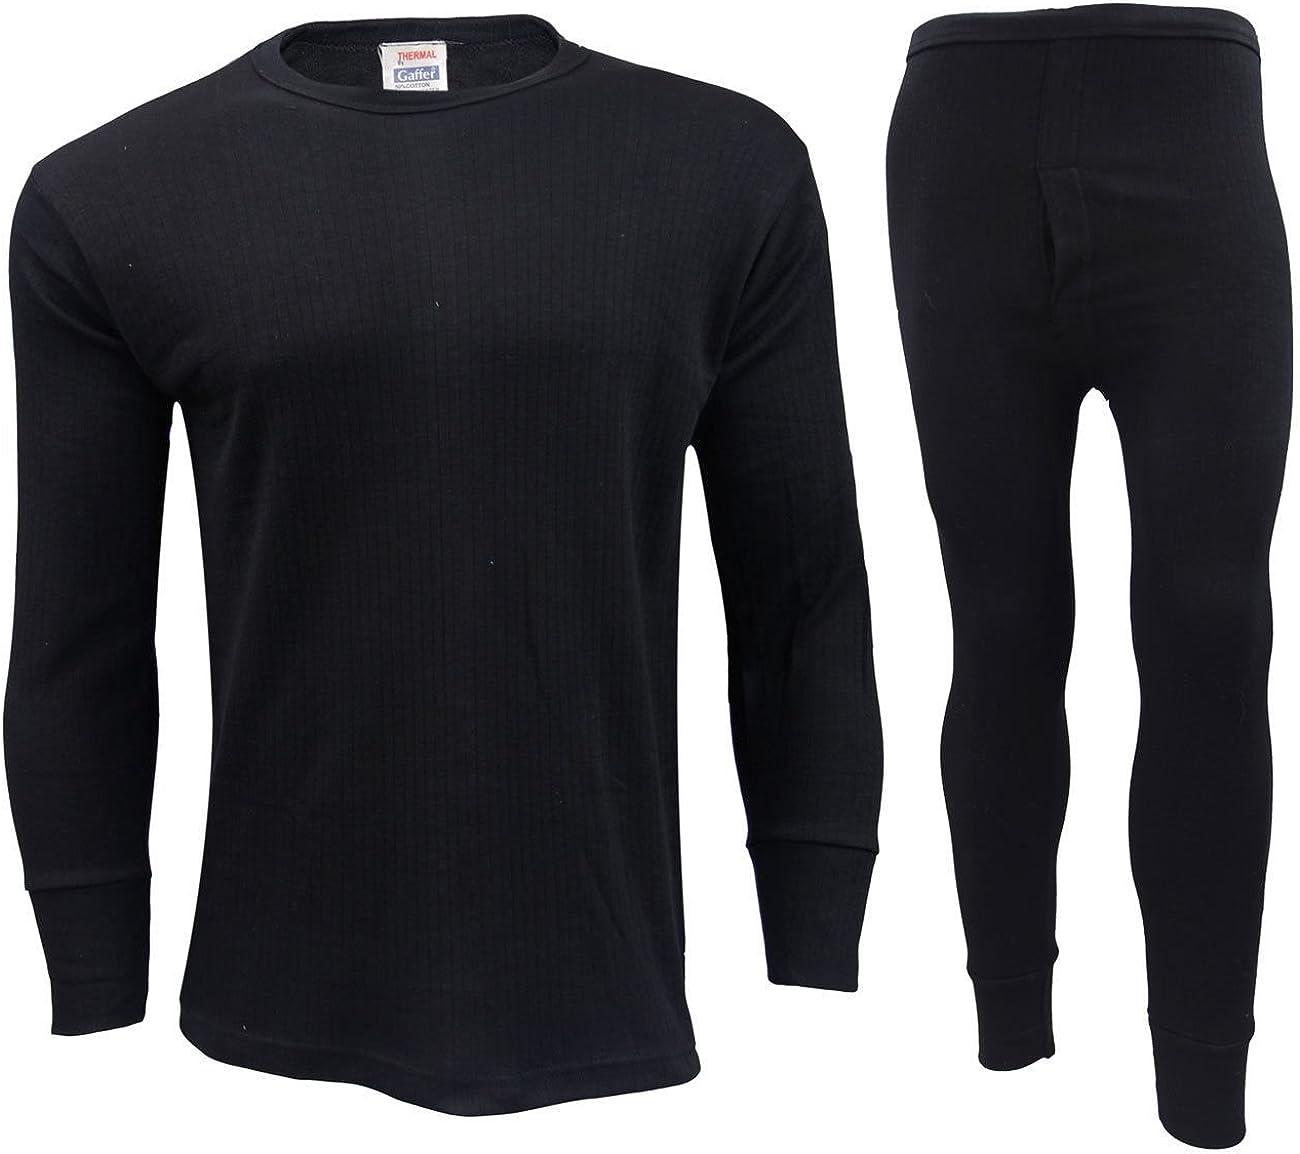 Gaffer Mens Thermal Sets Bottoms Tops T Shirt Long Johns Trousers Warm Vest Tshirt Winter Ski Wear Underwear